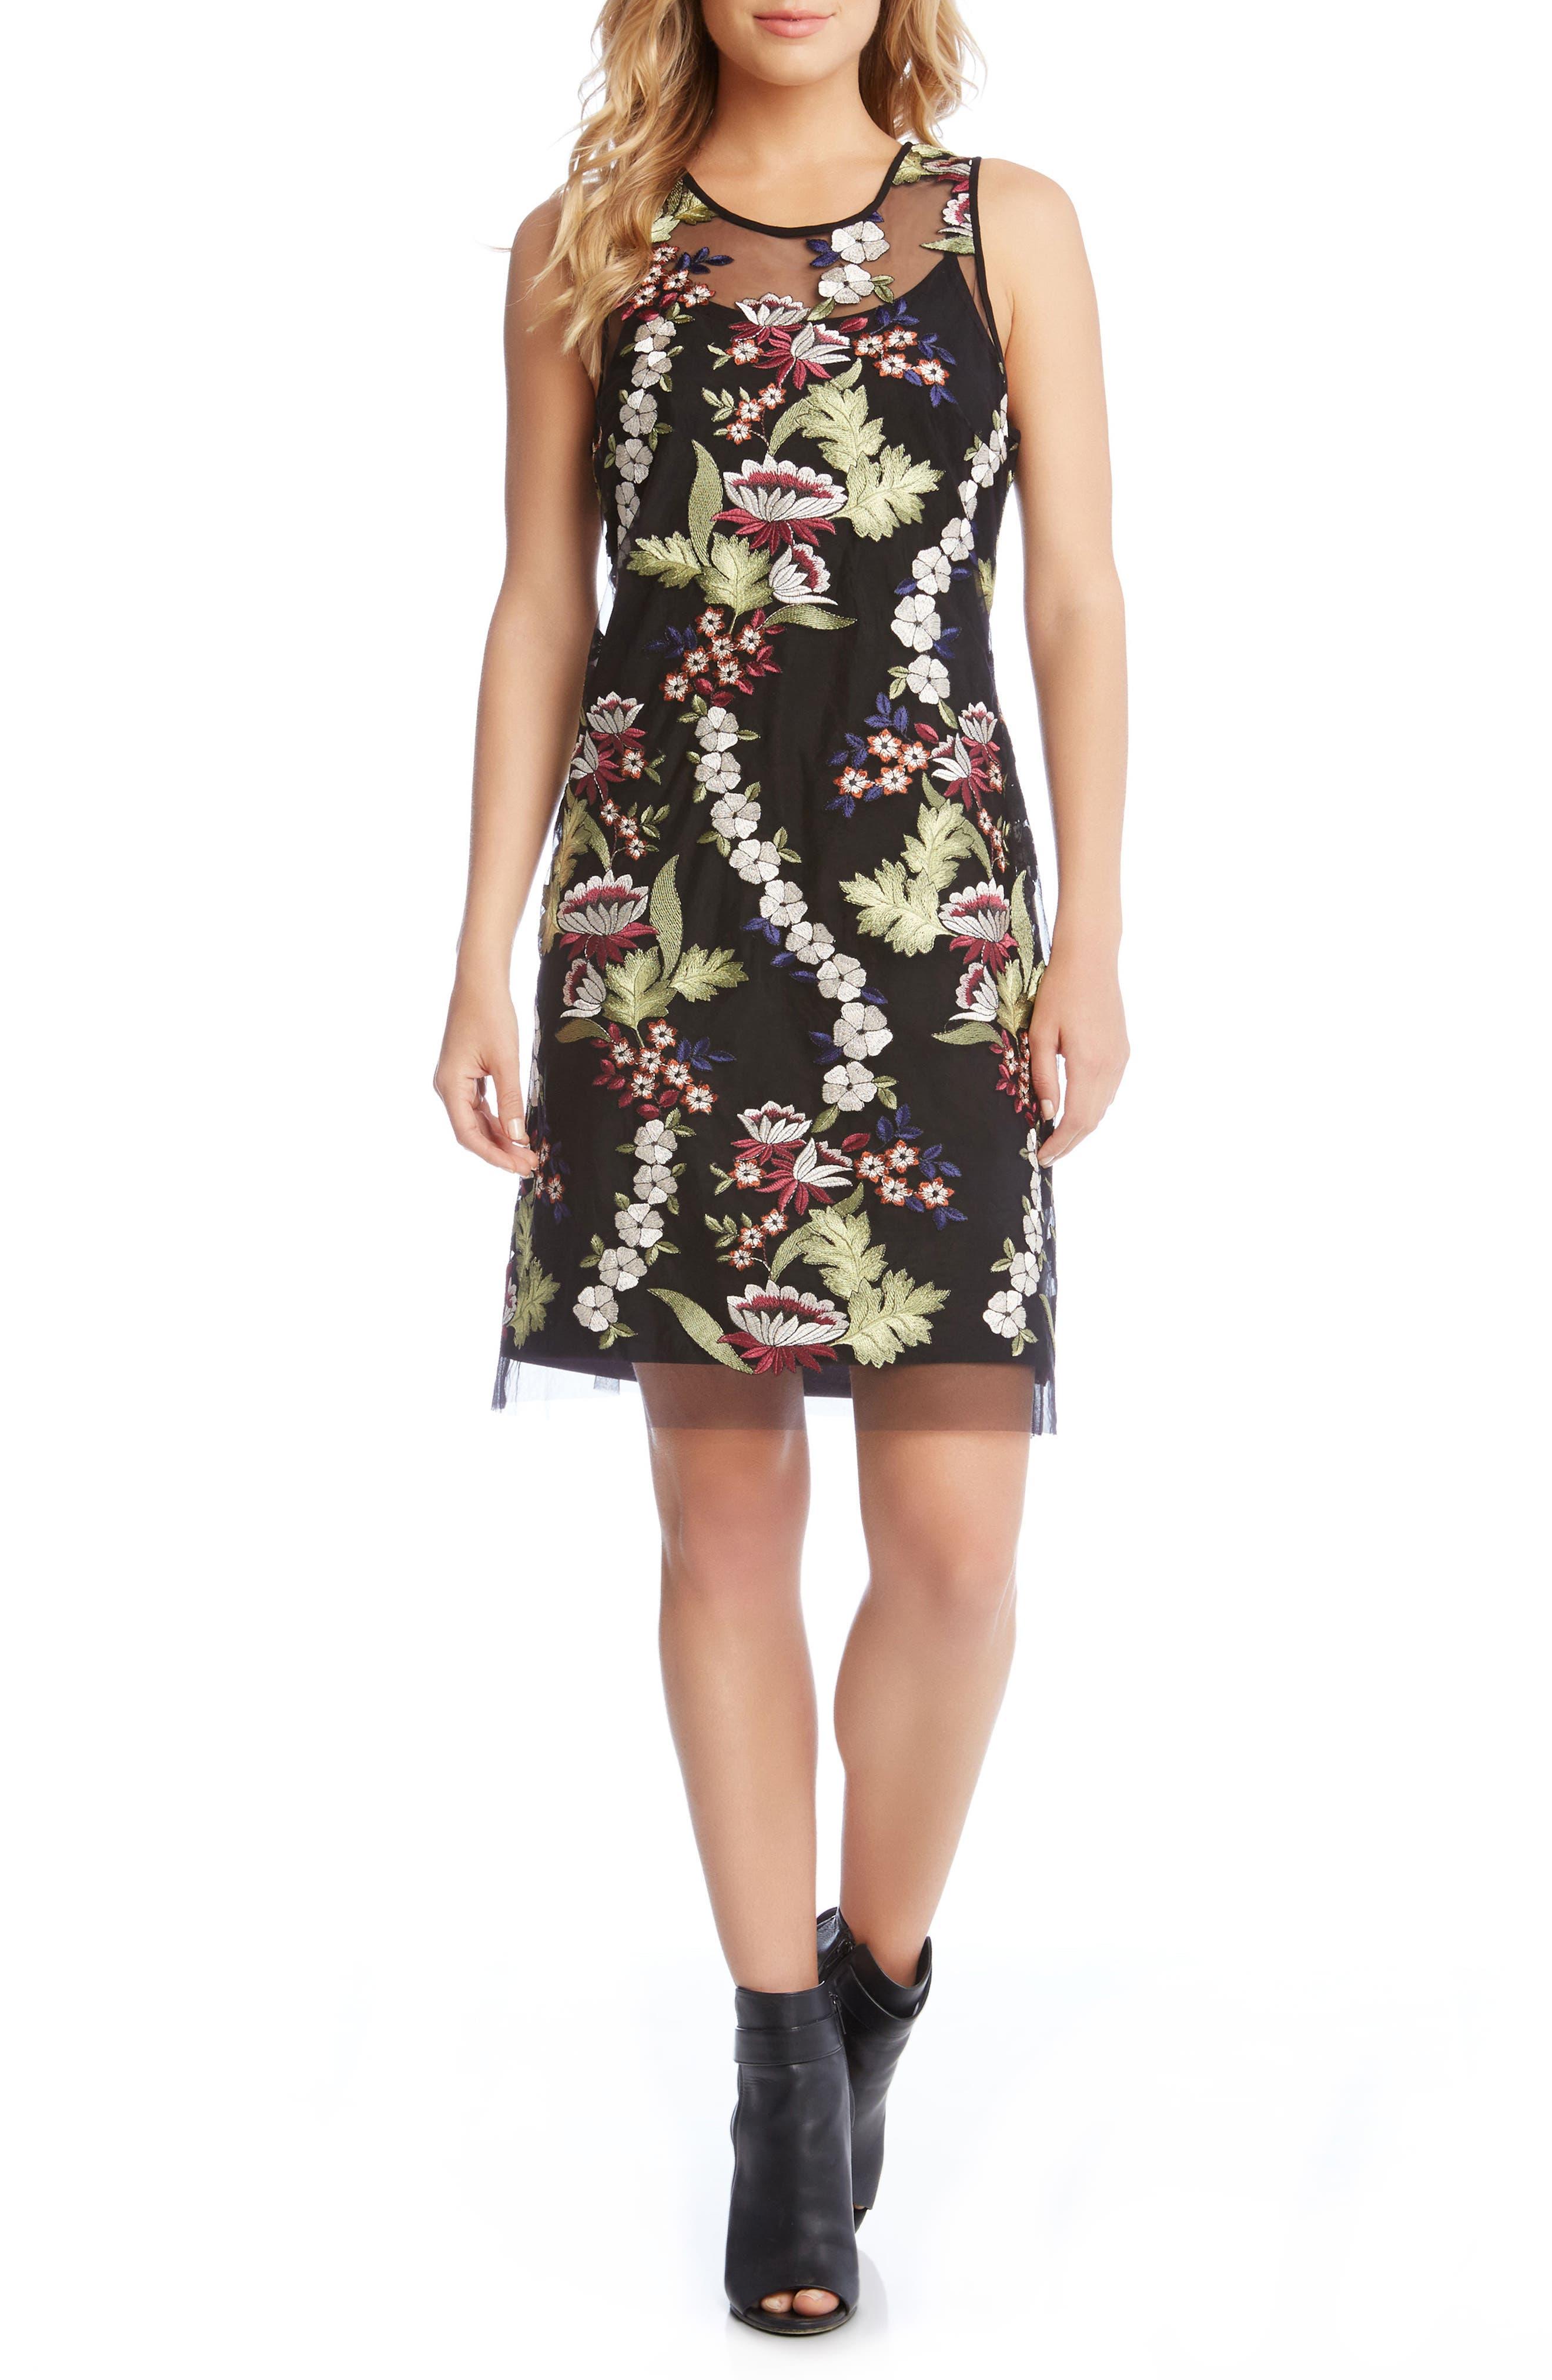 KAREN KANE Floral Embroidery A-Line Dress